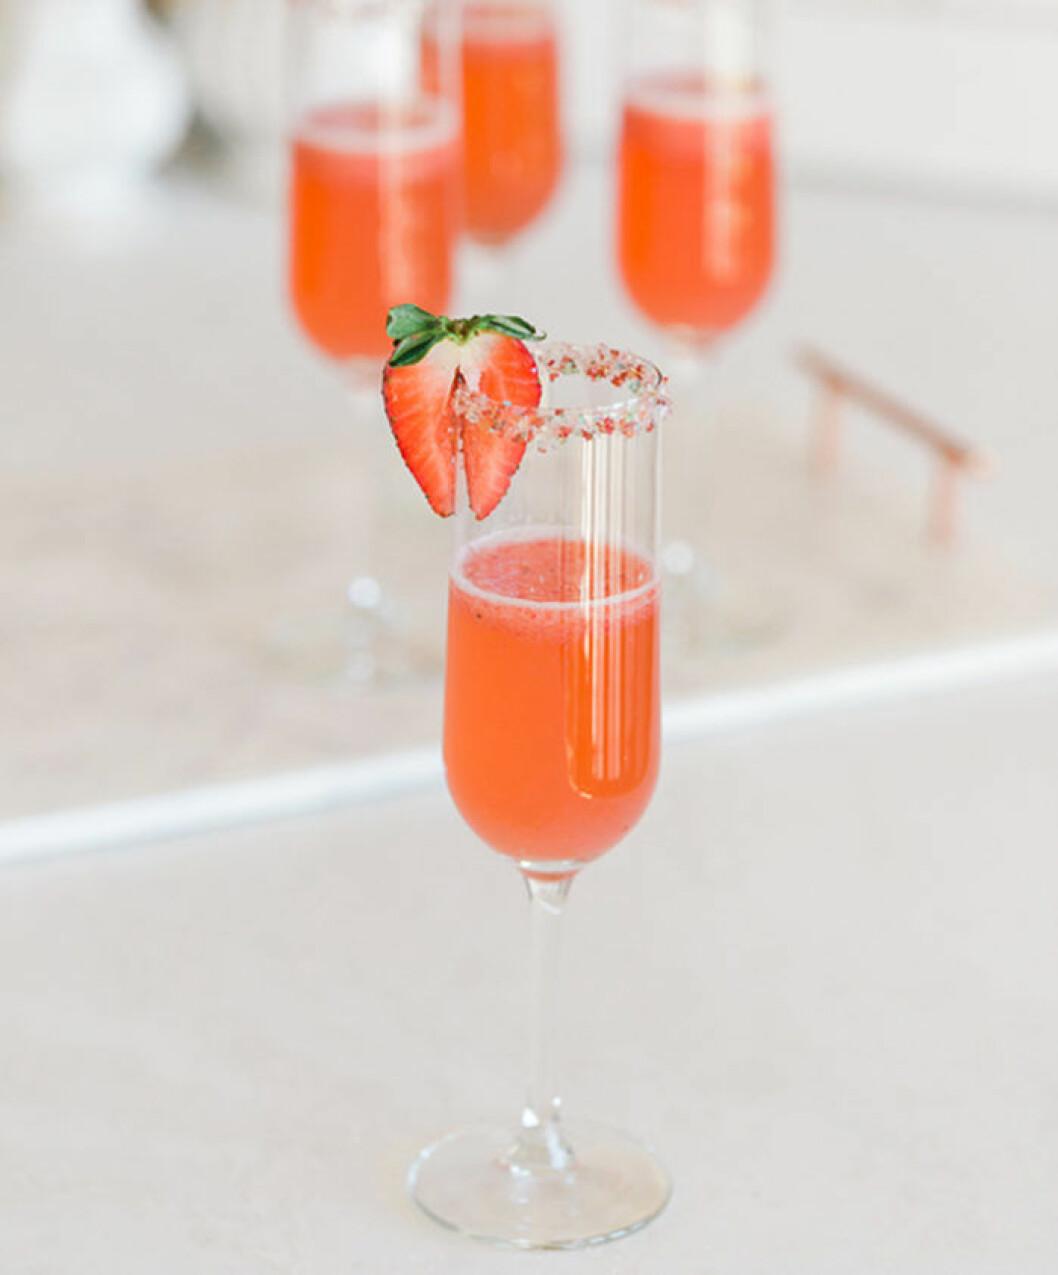 Glittrig jordgubbsdrink.